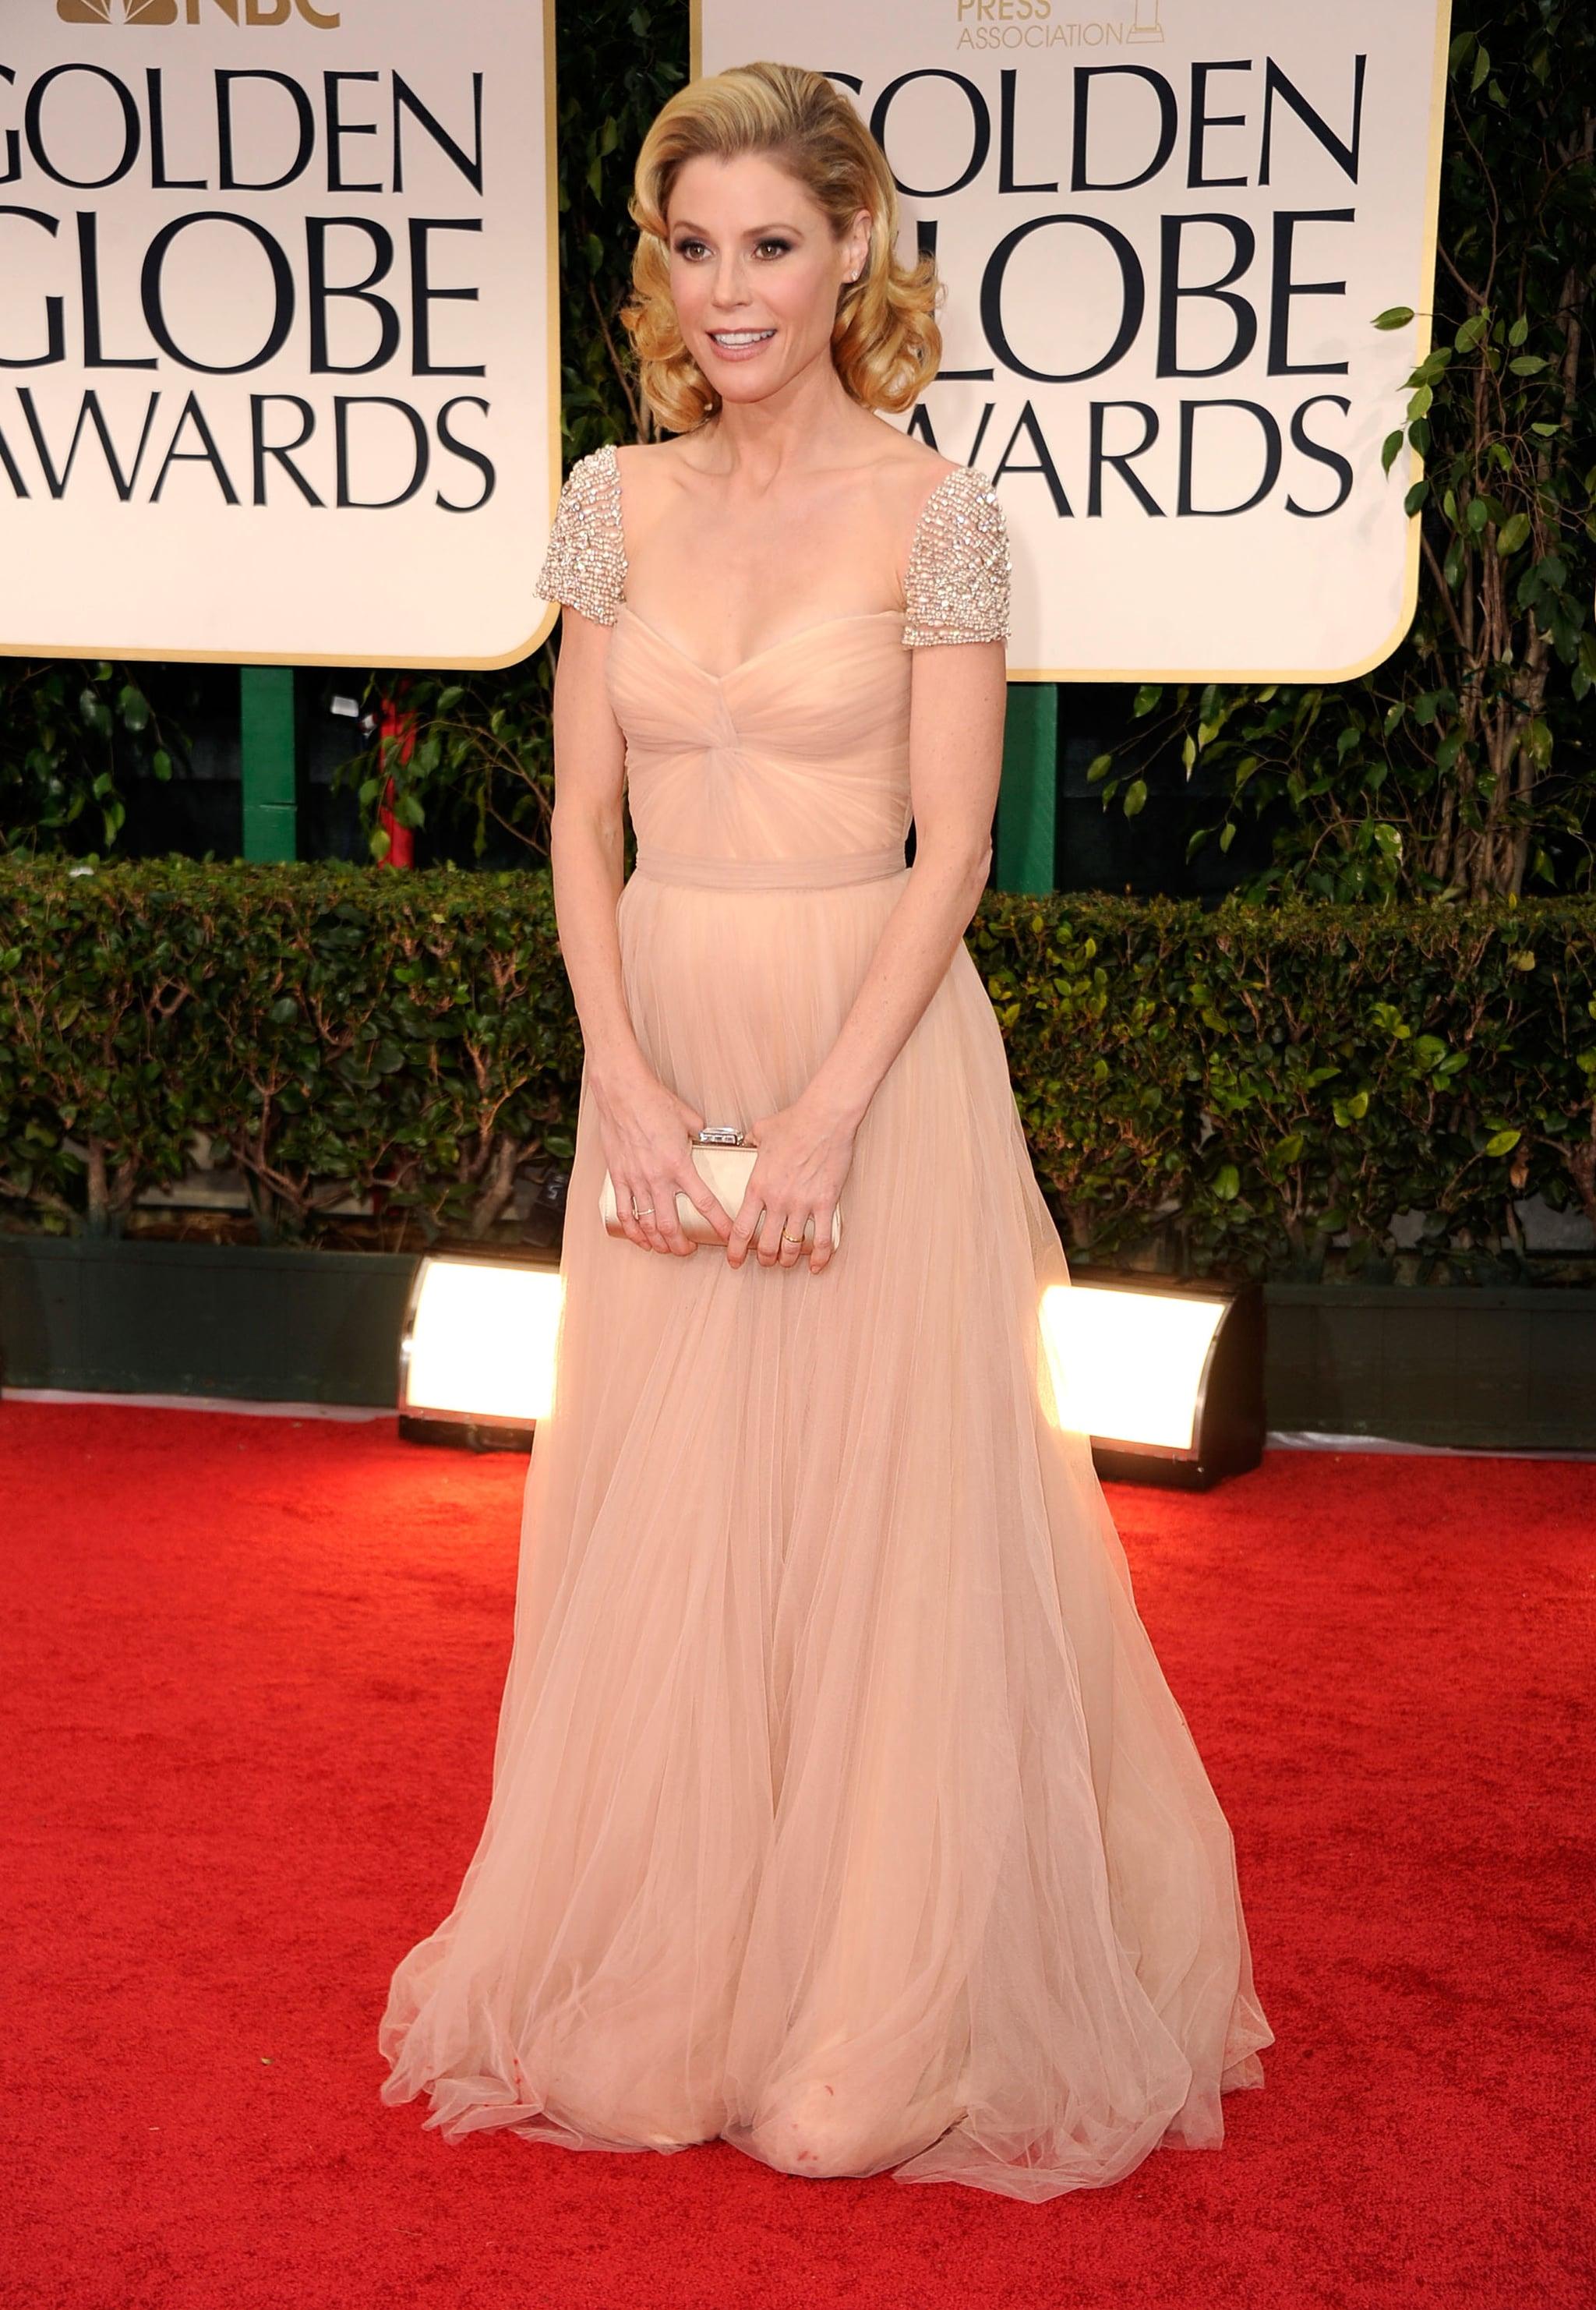 Julie Bowen in Reem Acra at the Golden Globes.